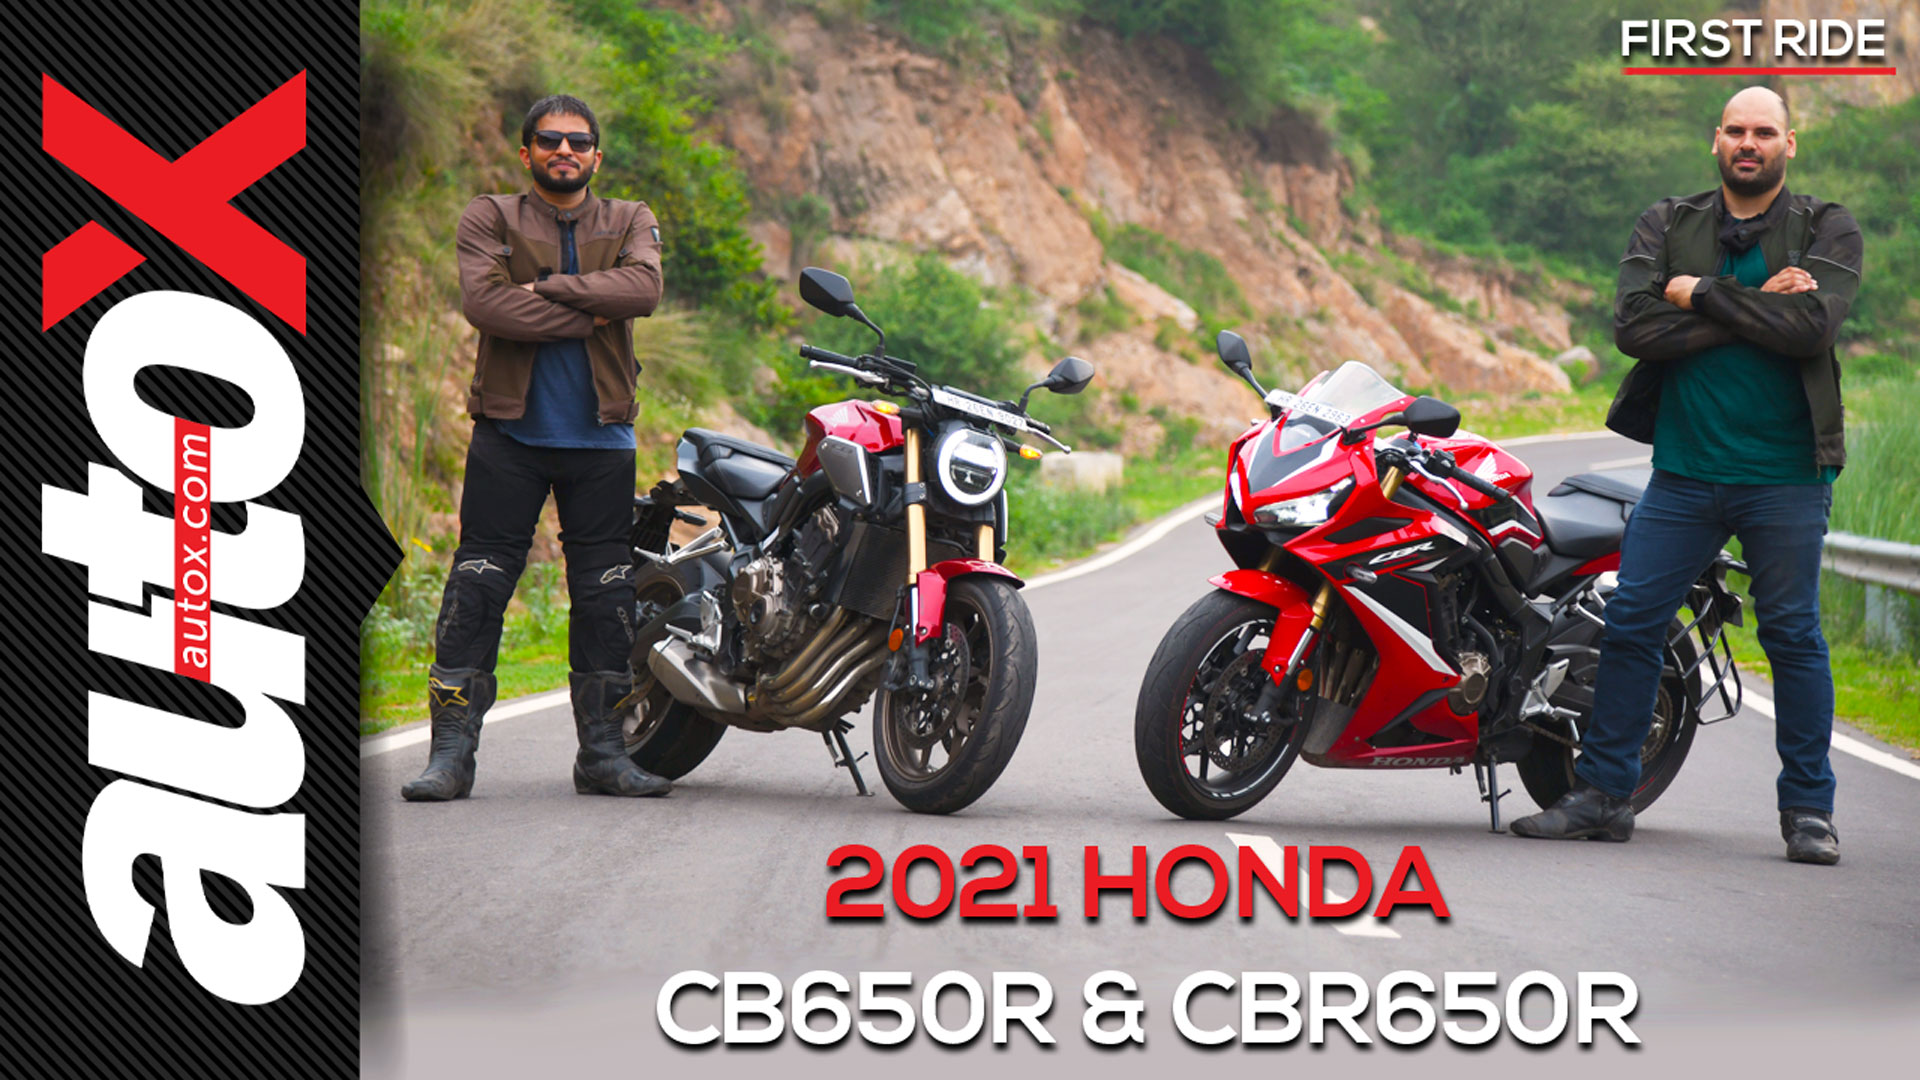 2021 Honda CB650R & CBR650R: Desirable but Costly Affair | Review | autoX